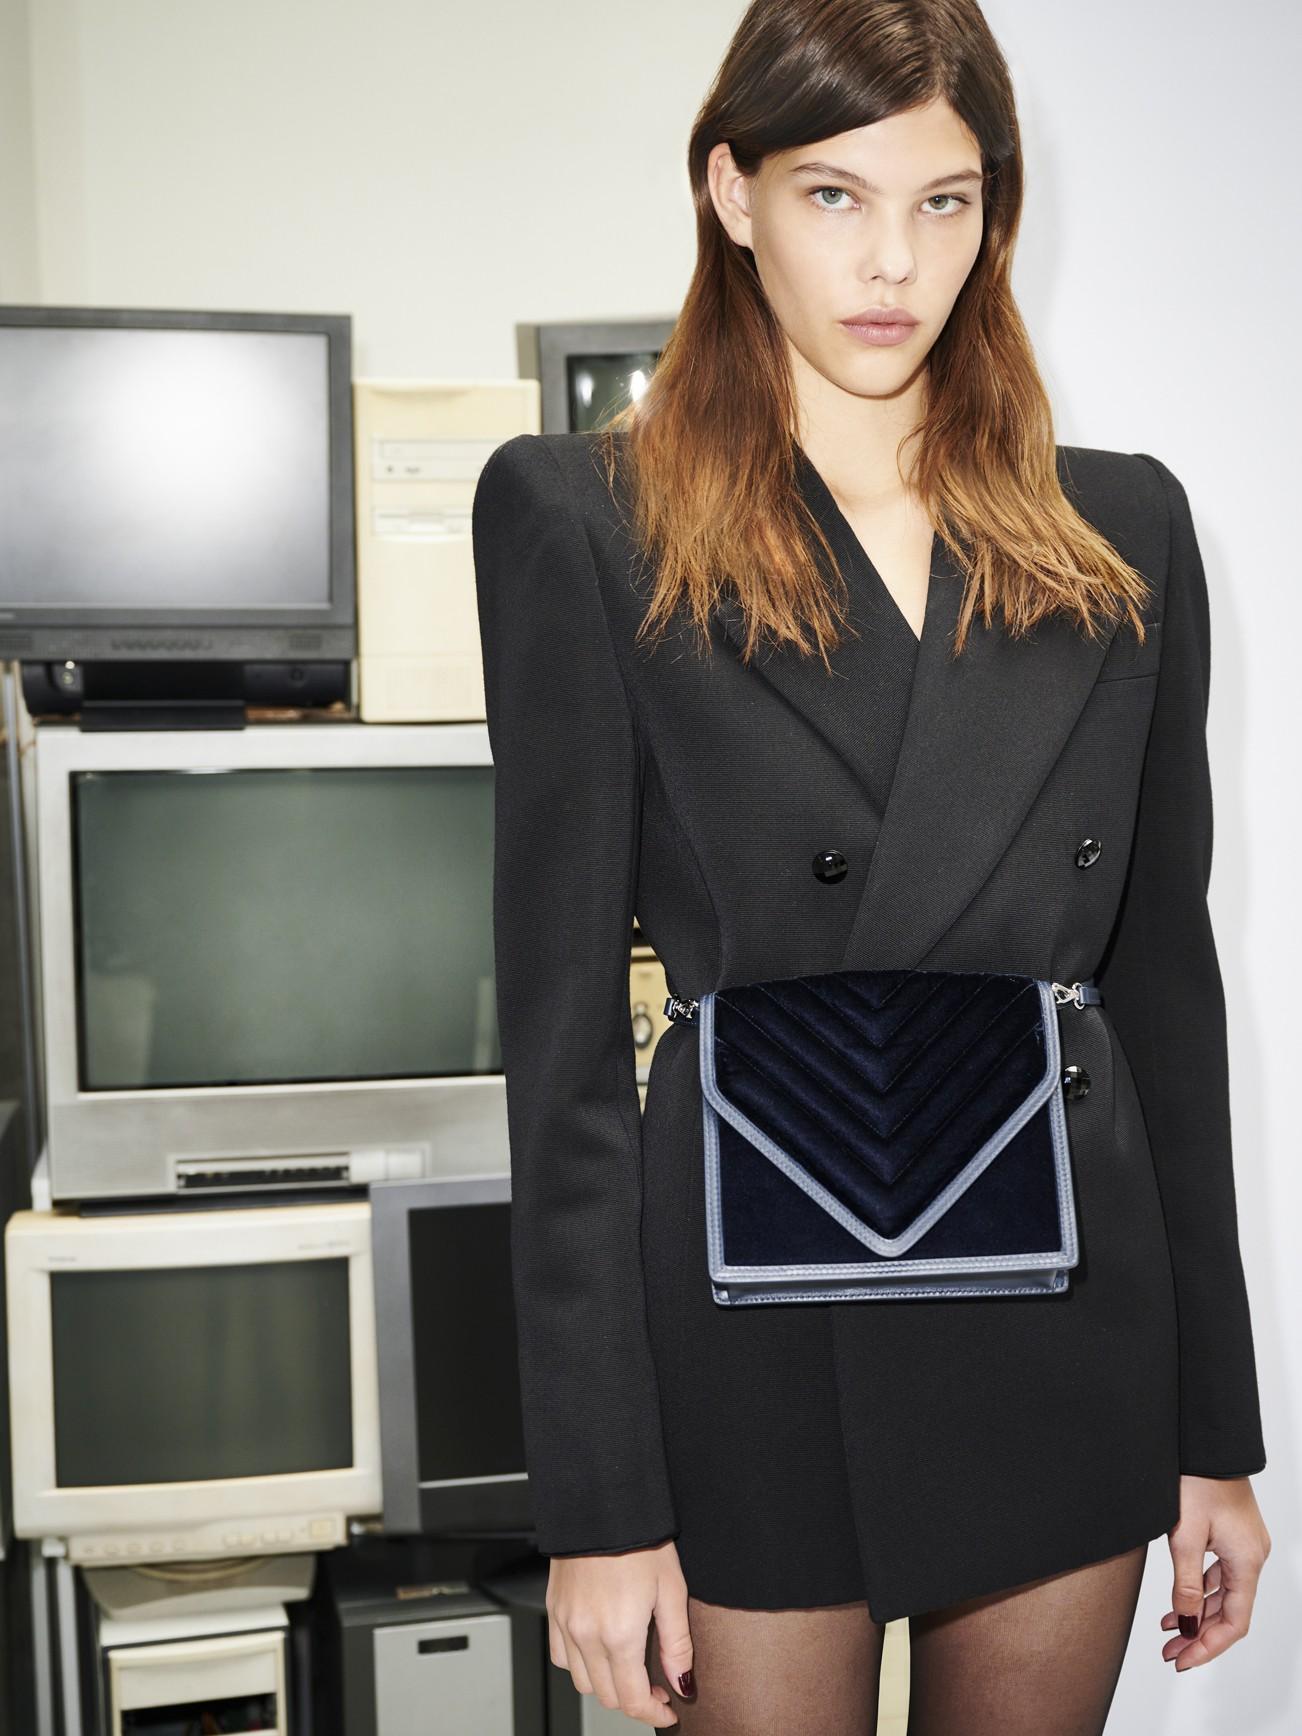 Alexa in Navy Quilted Velvet